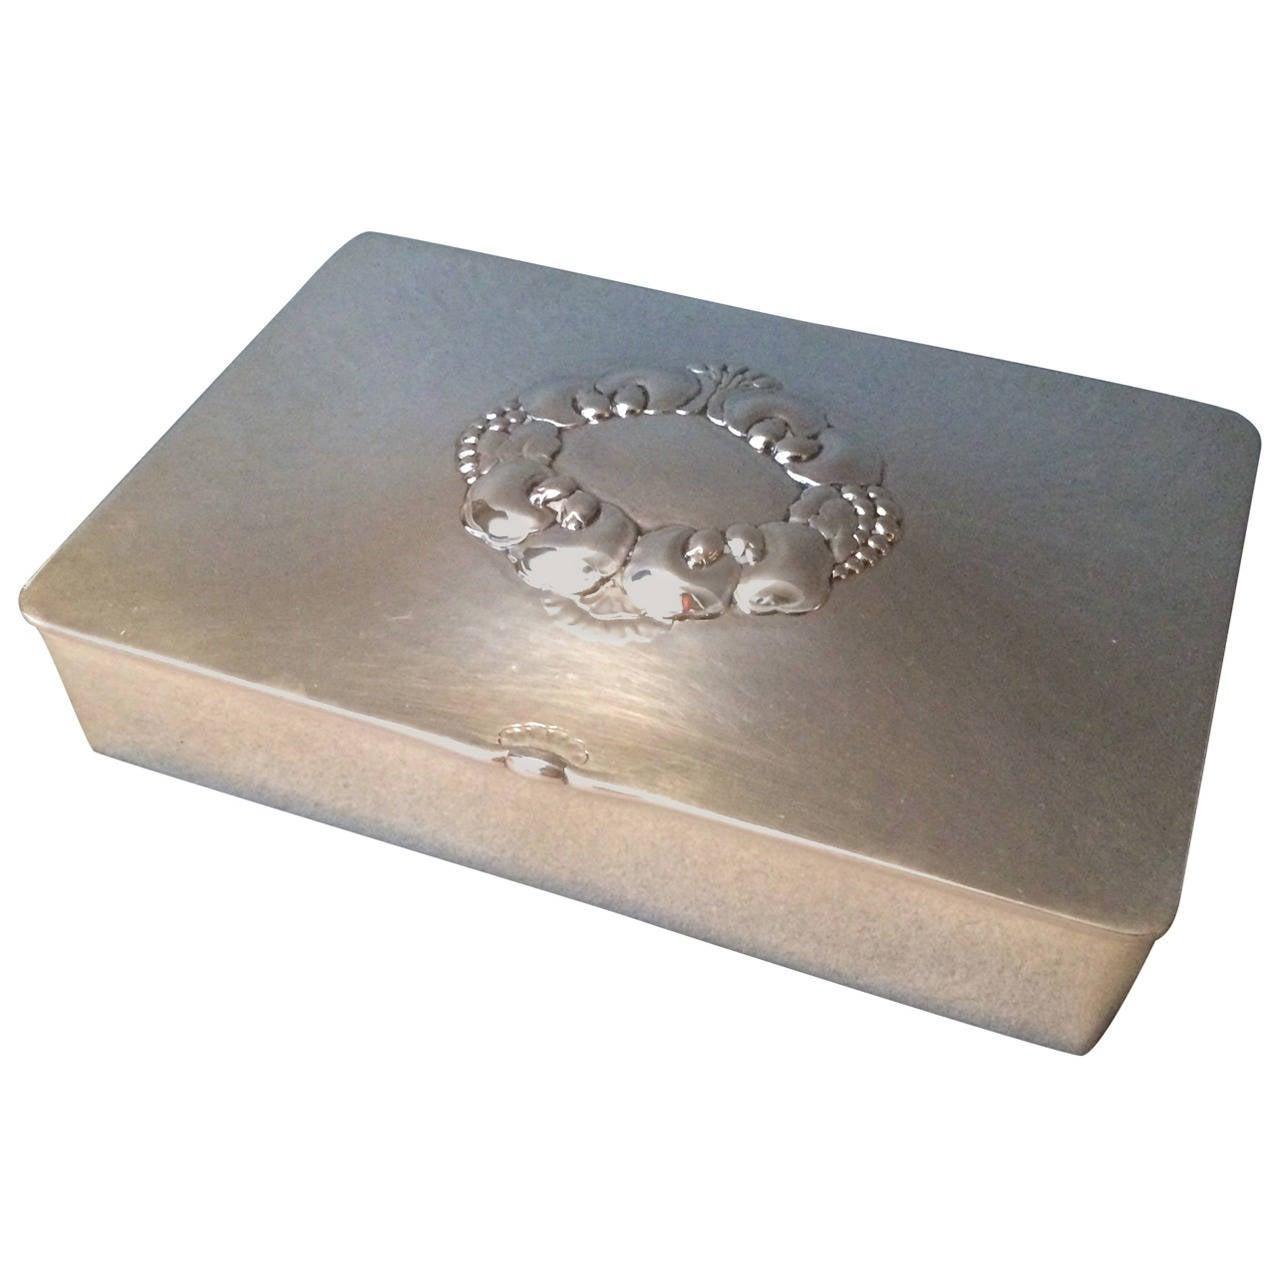 Georg Jensen Keepsake Box No. 507a by Gundorph Albertus